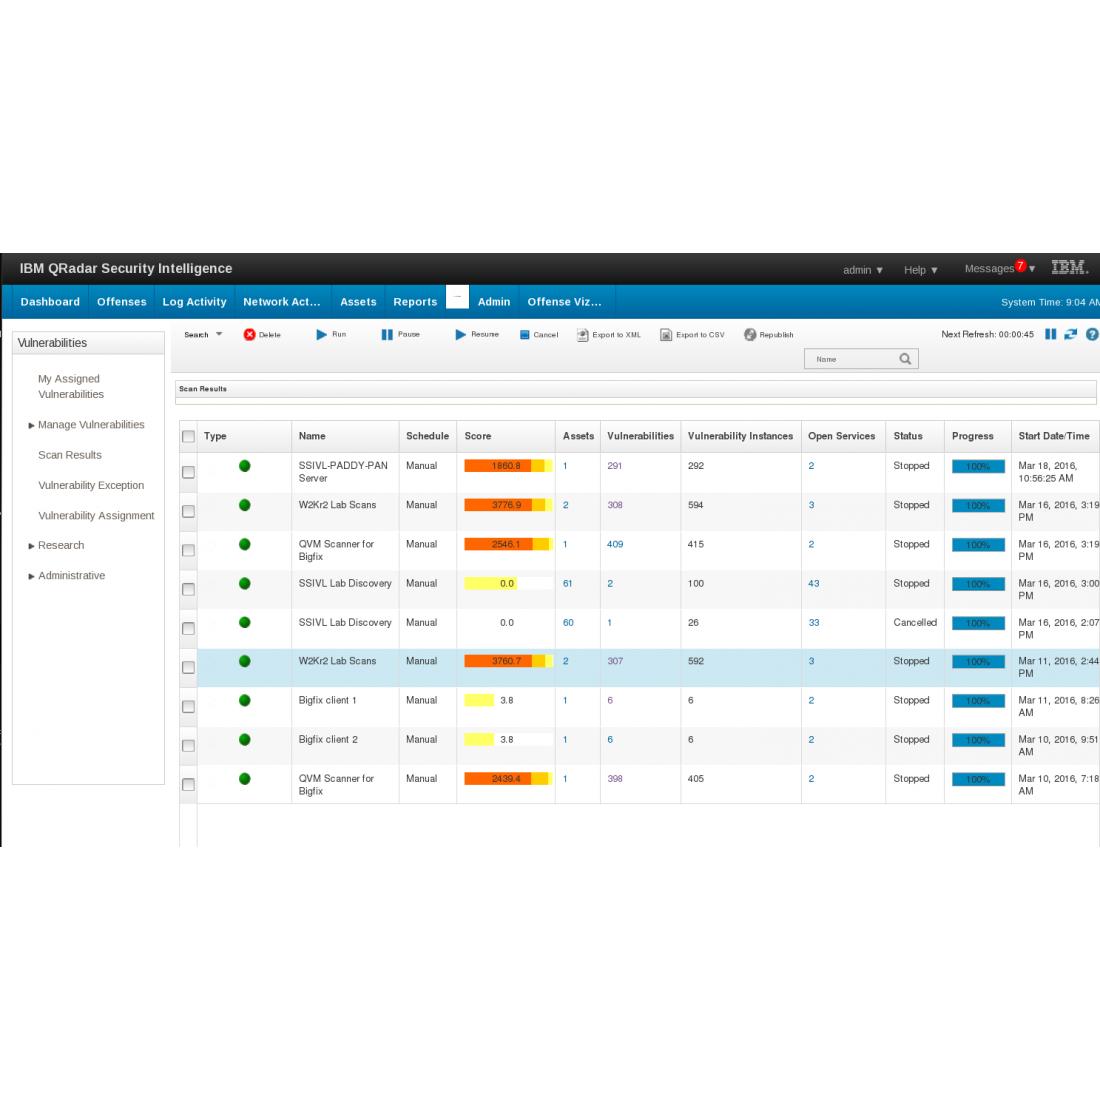 SIEM Security | QRadar Appliance 3129 | AI Security Automation